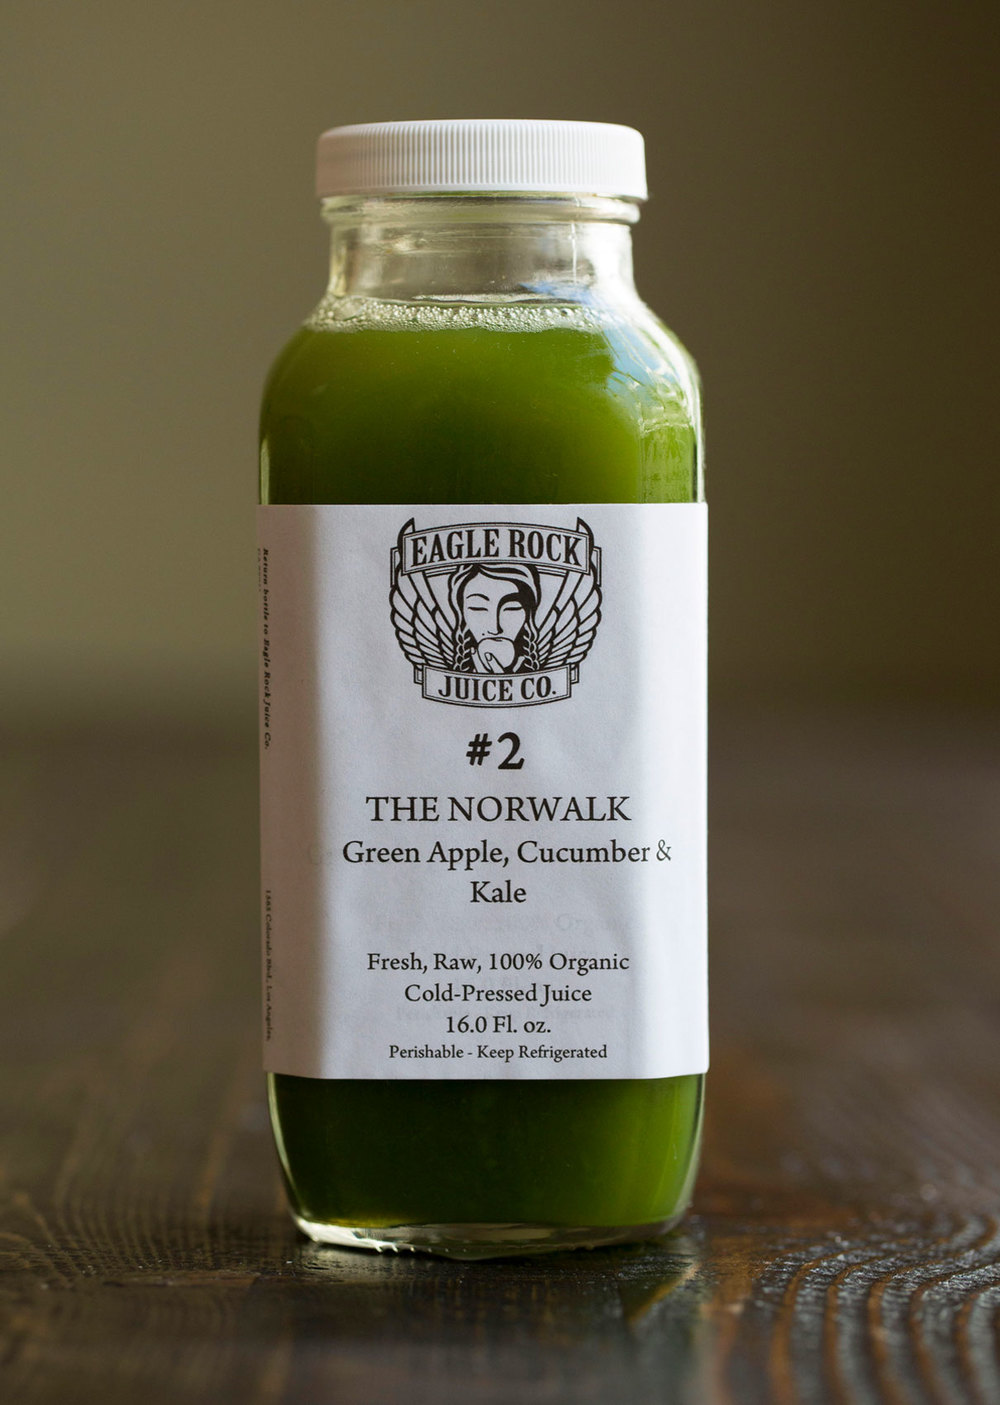 #2 The Norwalk   $22.50/11.25/9.25 Green Apple, Cucumber & Kale